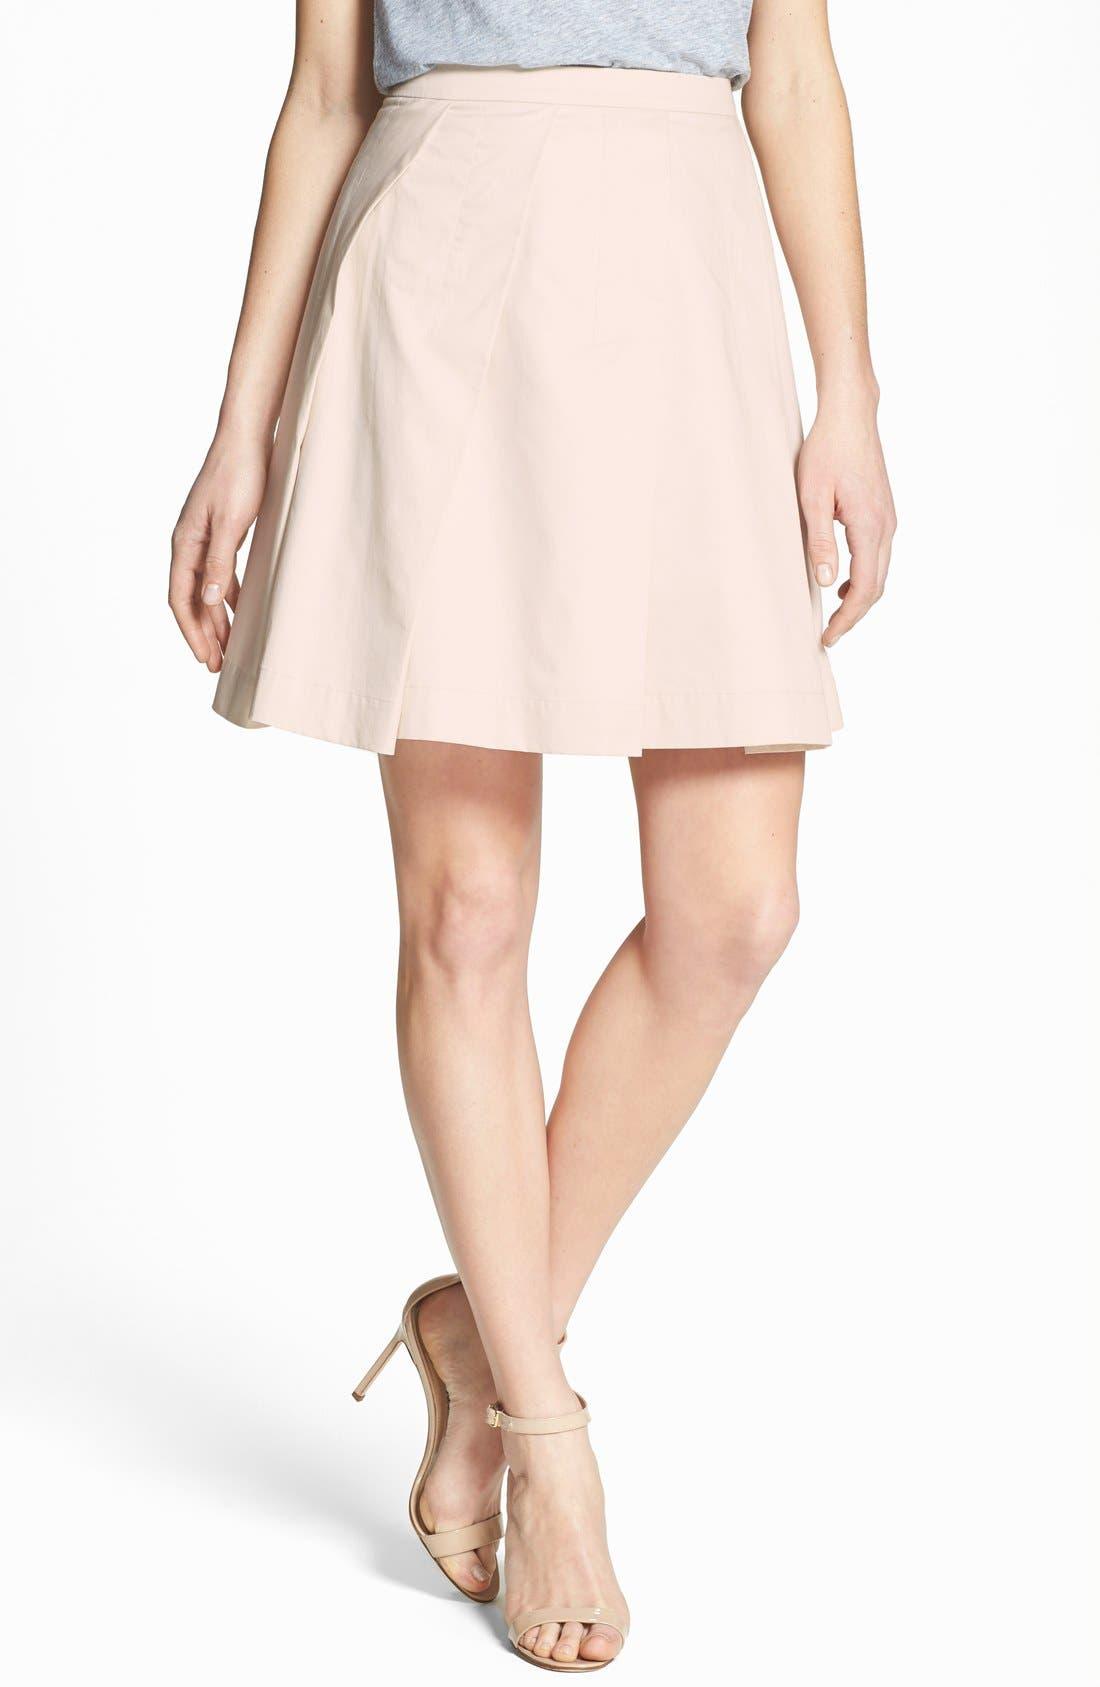 Alternate Image 1 Selected - Theory 'Sarise' Pleat Full Skirt